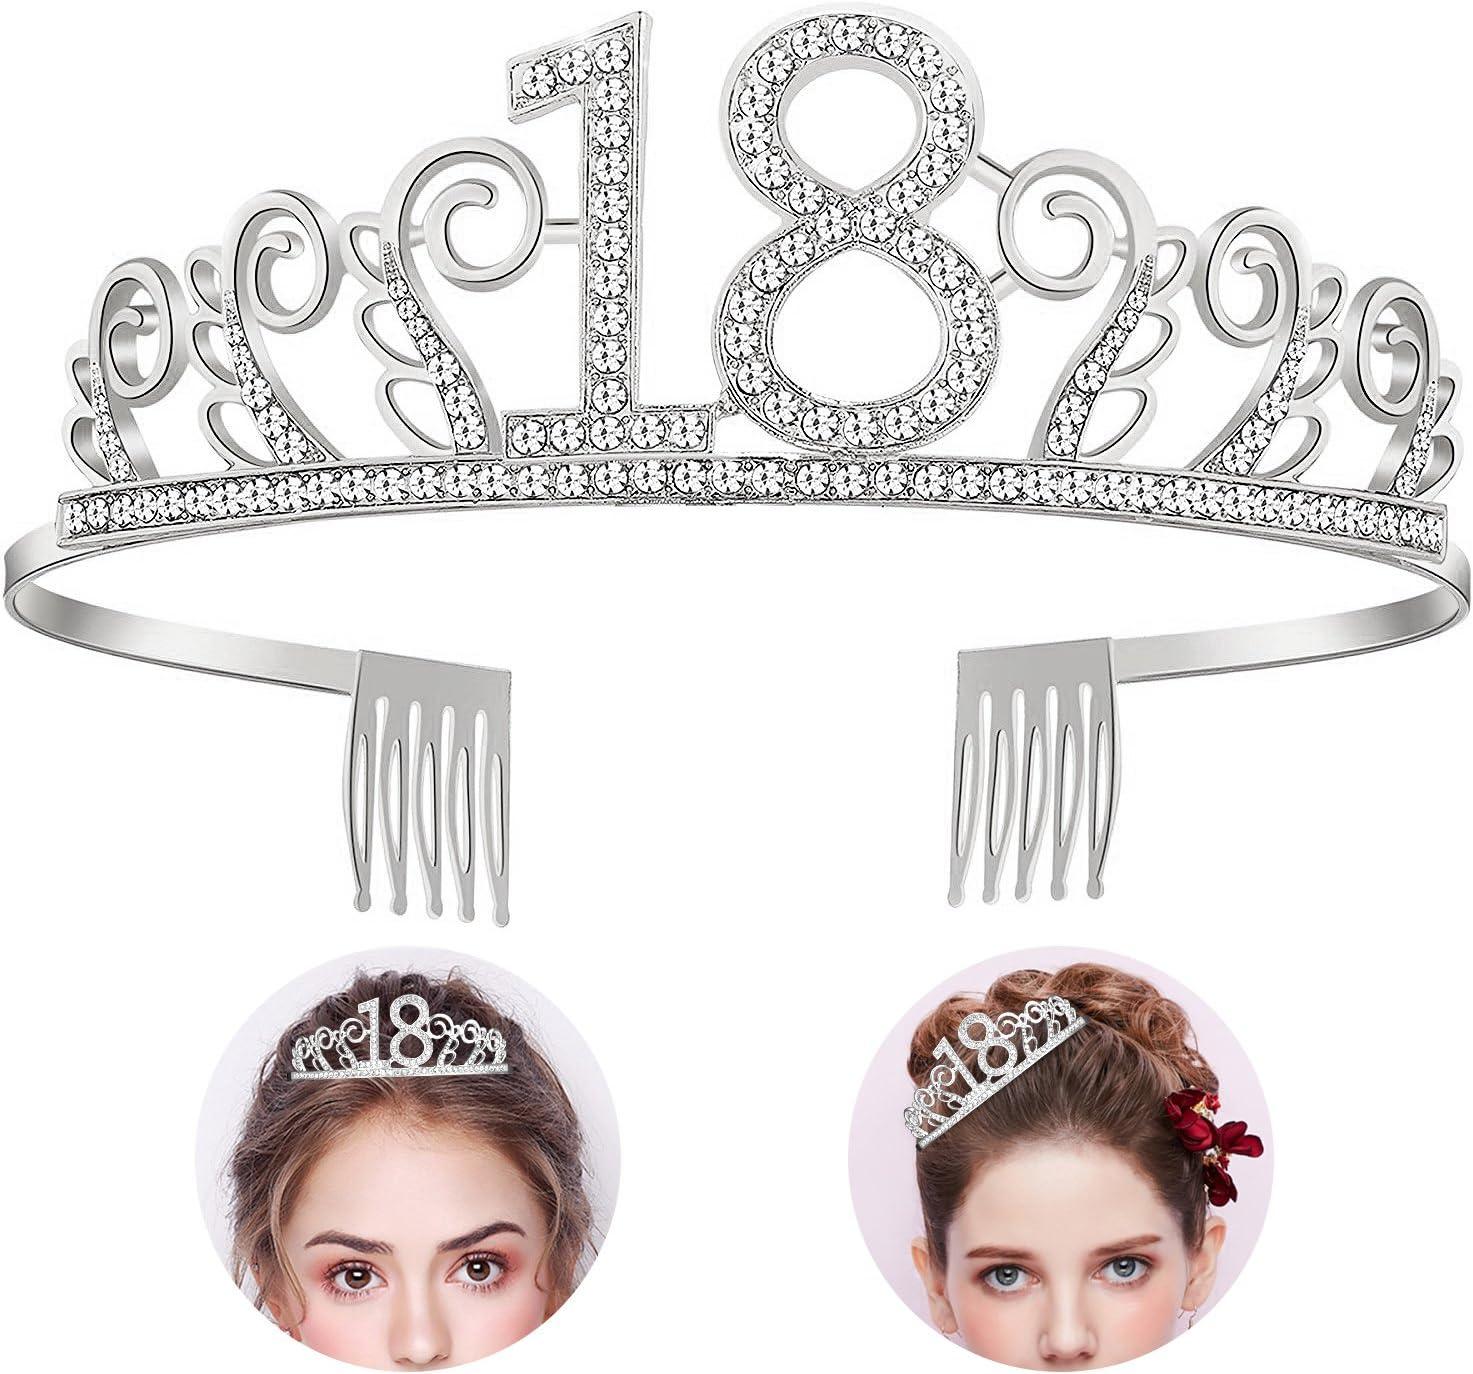 Feliz Cumpleaños 18TH, Diealles 18TH Plata Cristal Tiara Corona de Cumpleaños, Regalo de 18 Cumpleaños